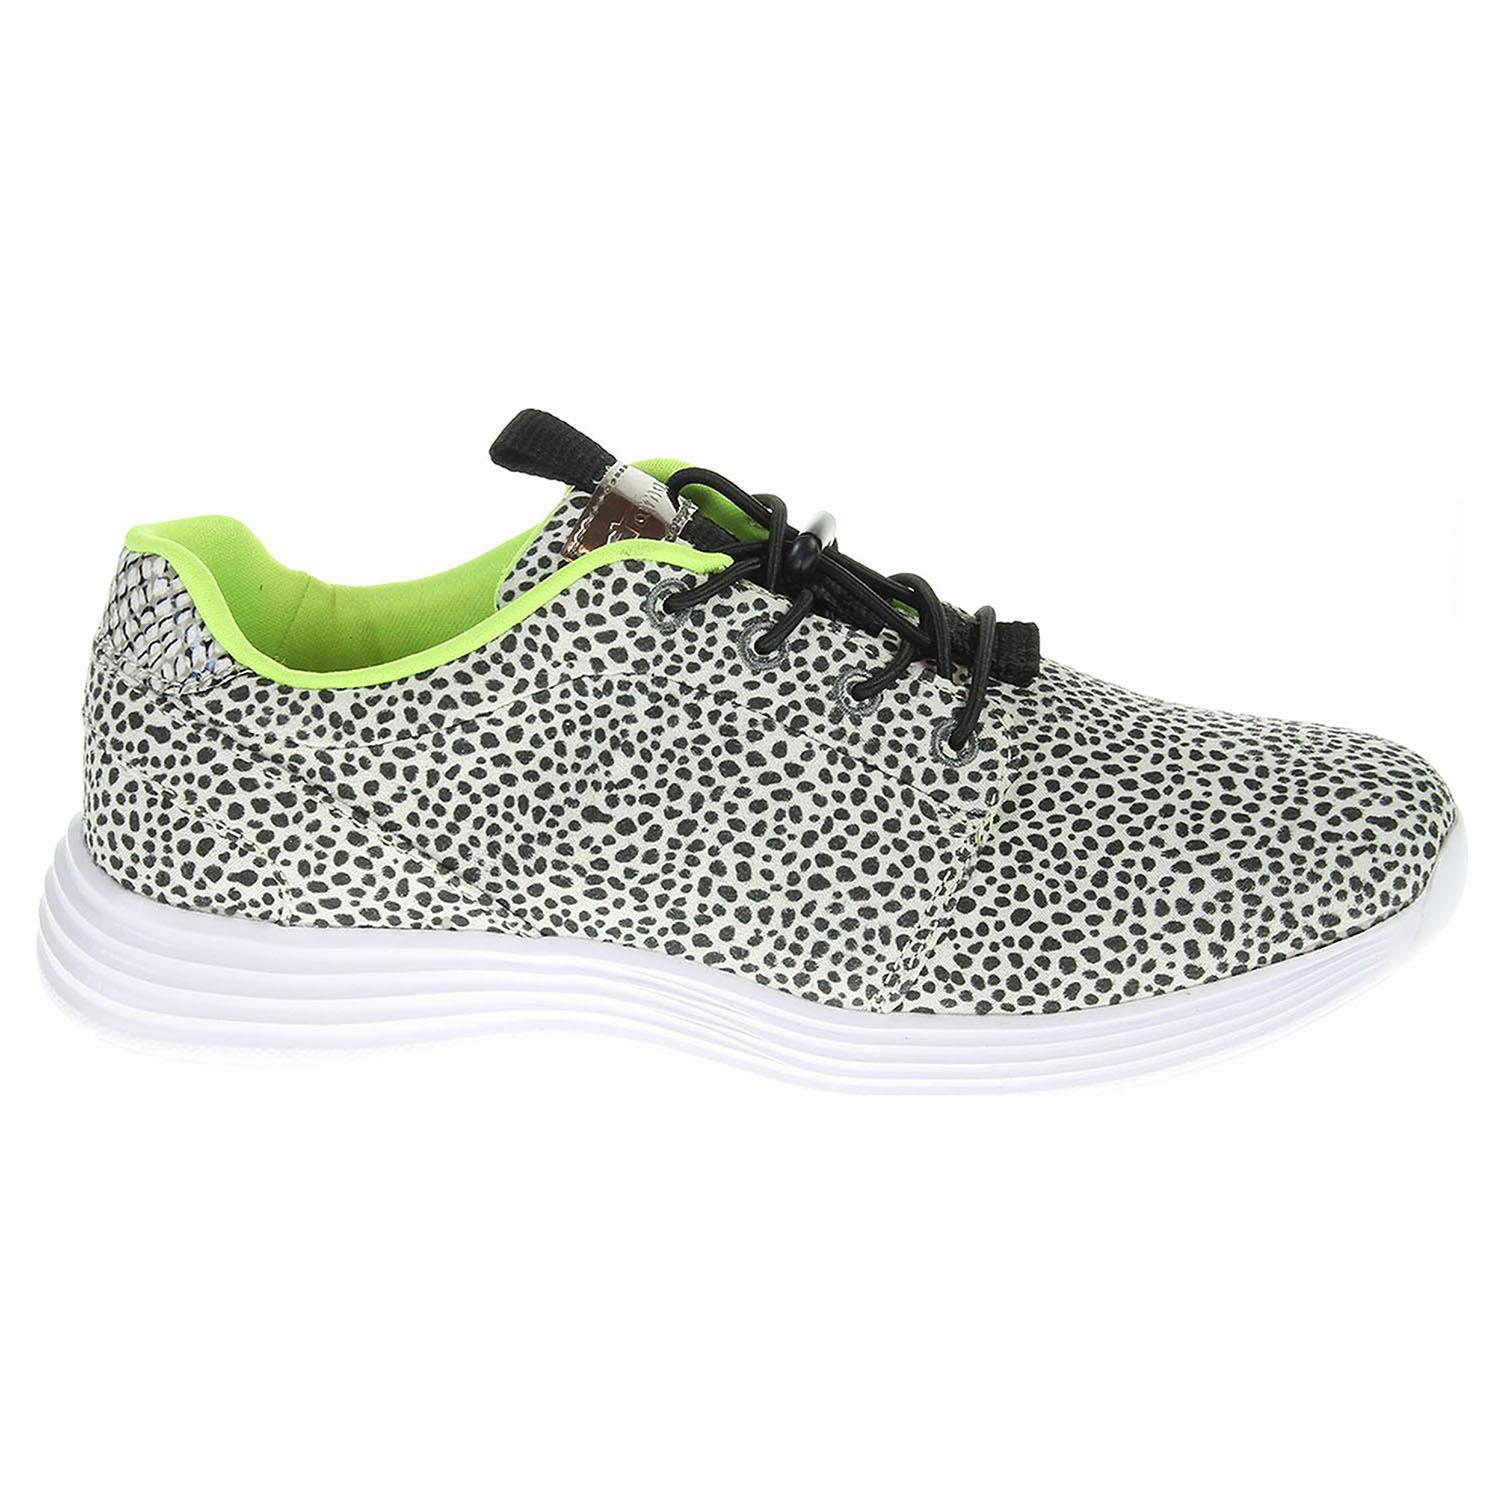 Ecco Tamaris dámská obuv 1-23707-26 černá-béžová 23200520